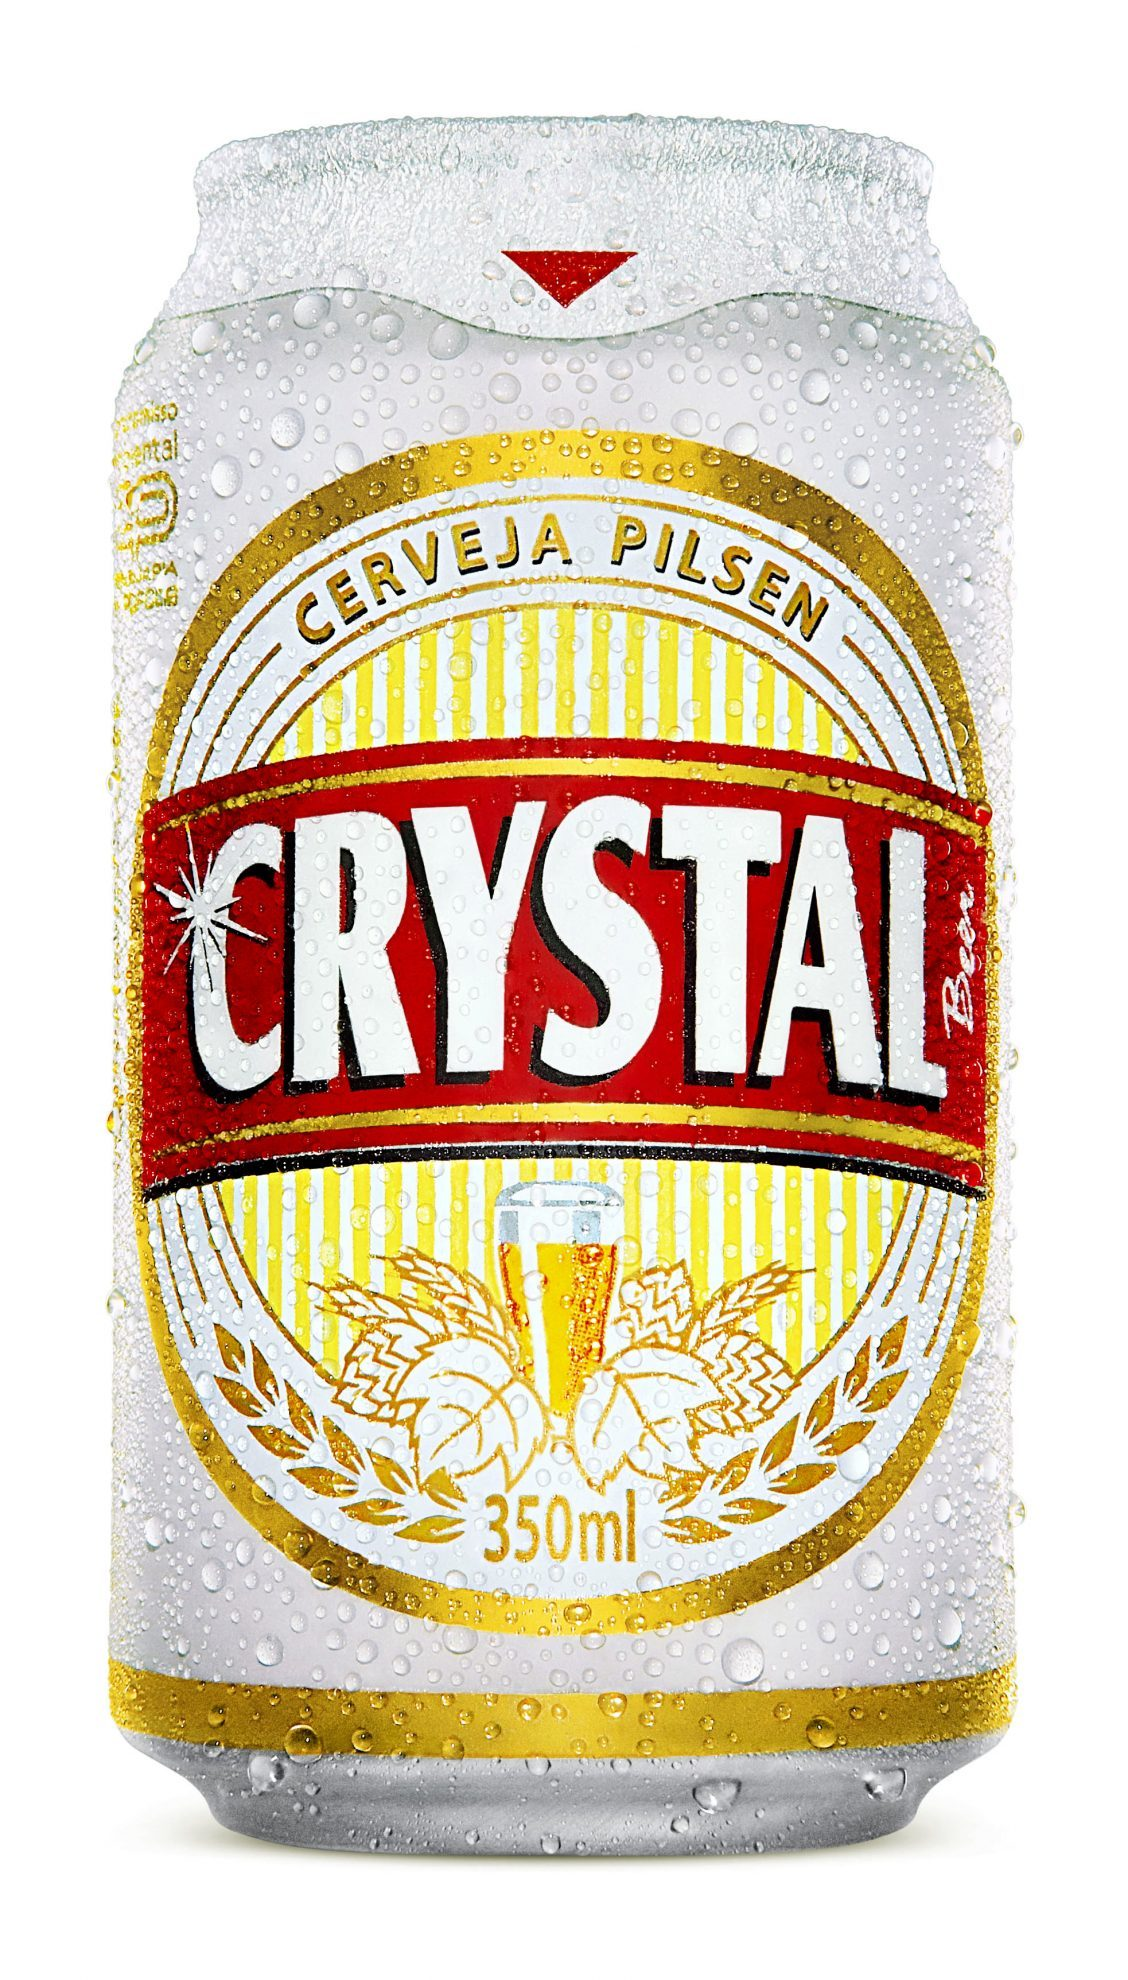 Evolucao da identidade visual da cerveja Crystal (6 pics)